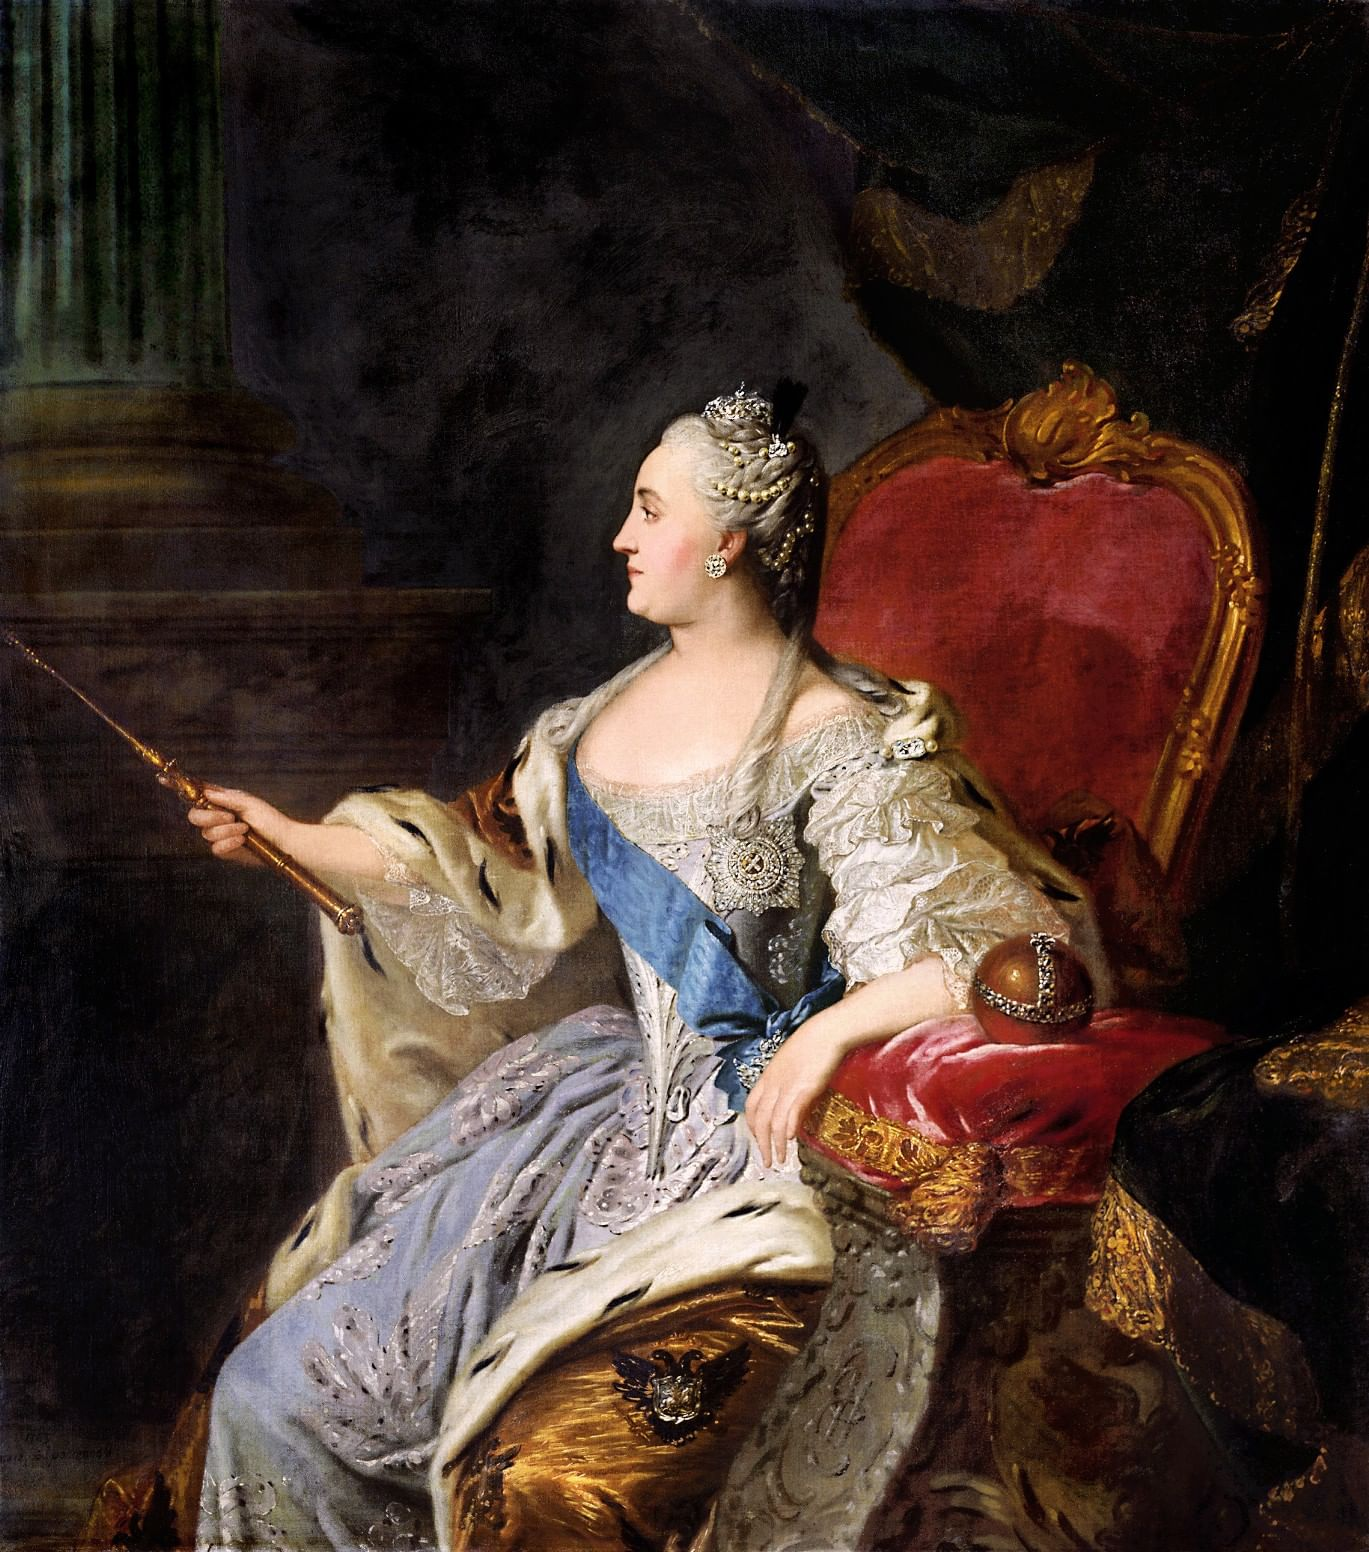 Родители - детям. Галерея 1. Екатерина II